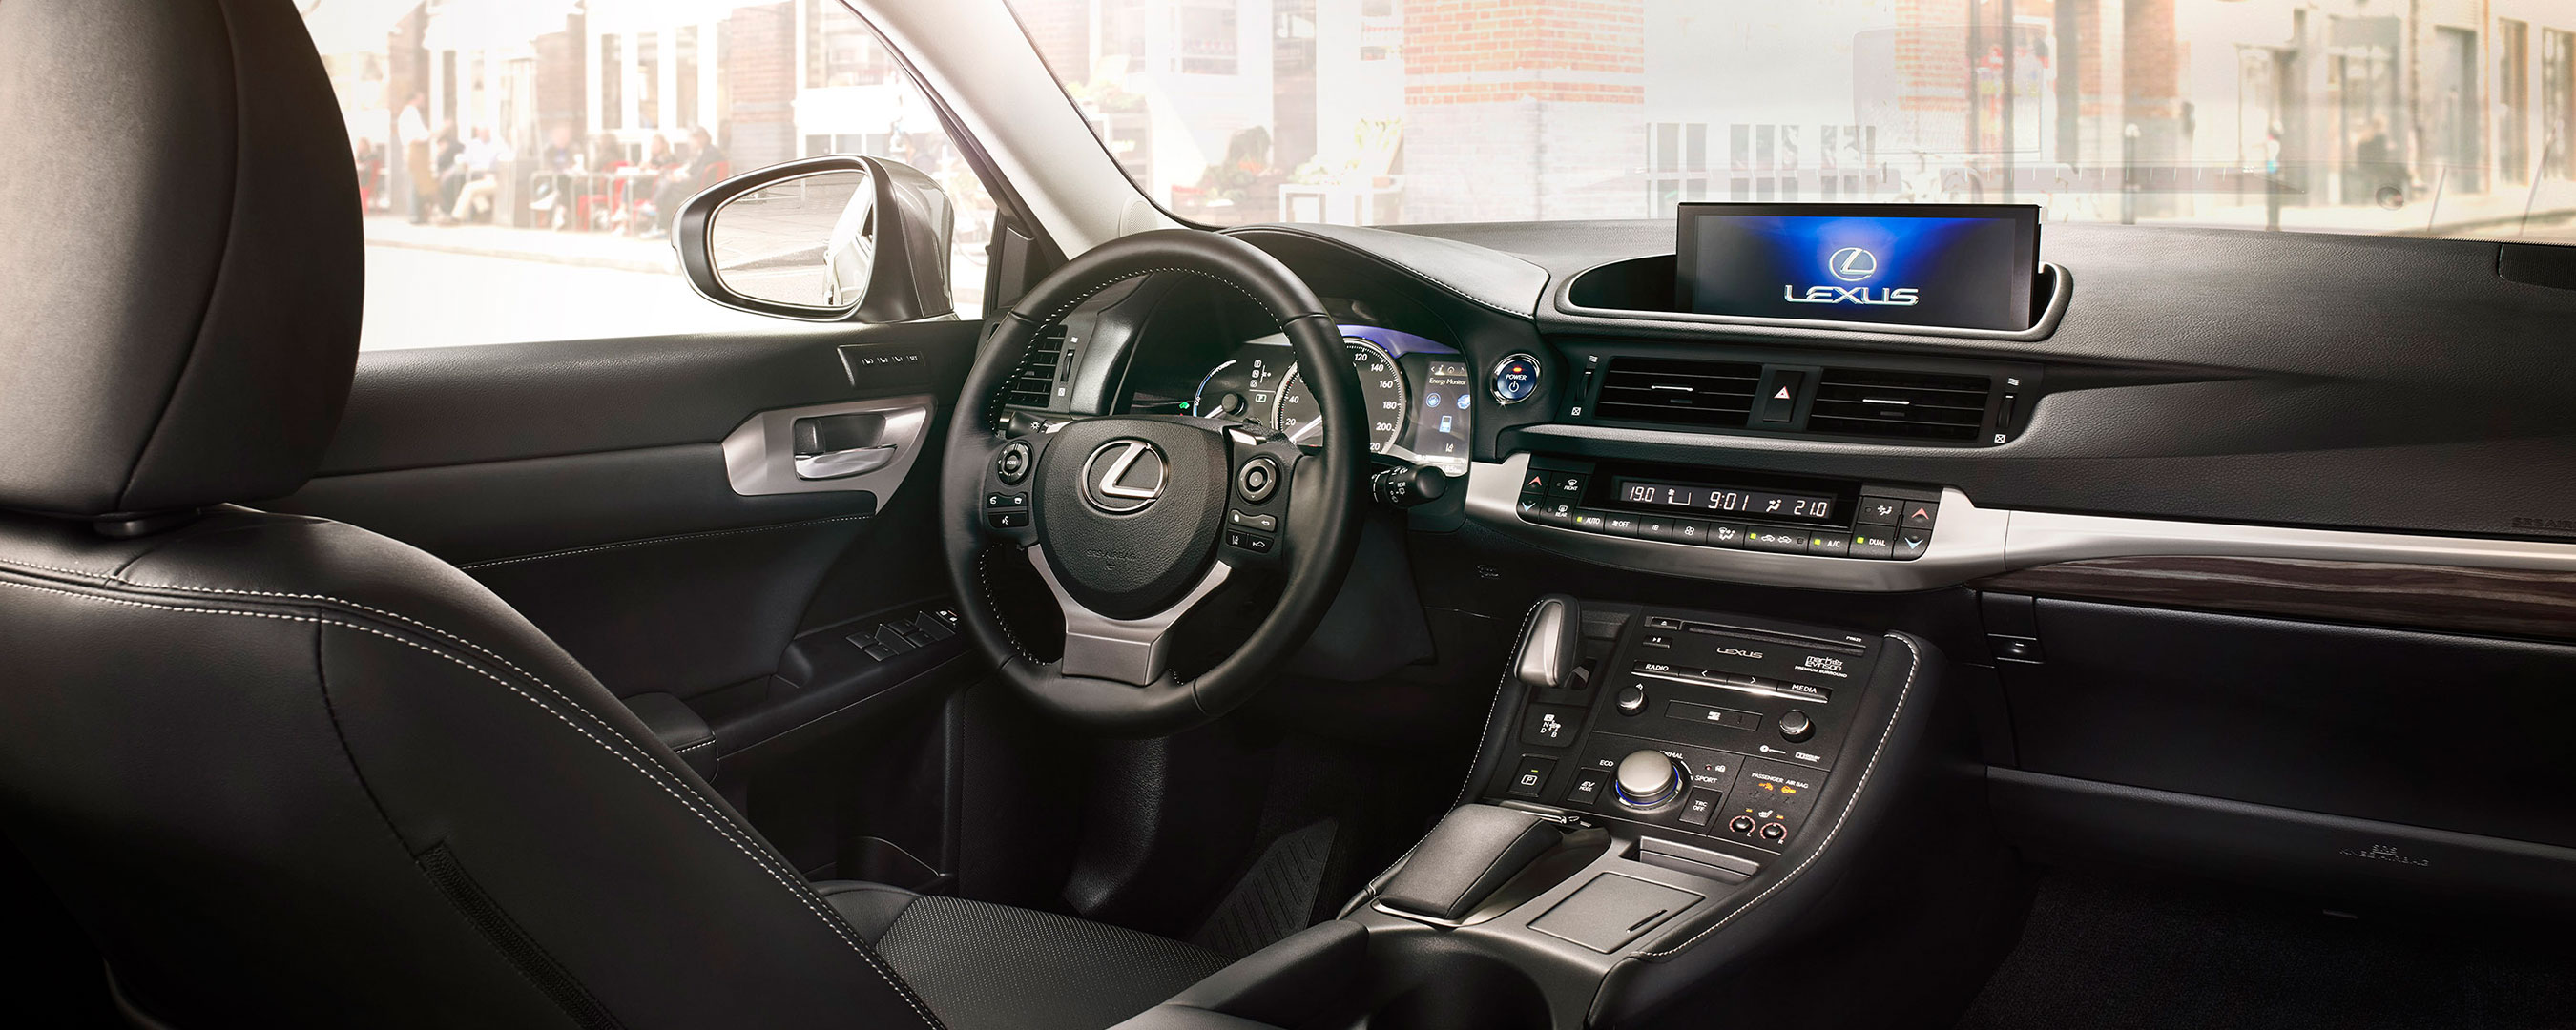 Binnenkant Lexus CT 200h